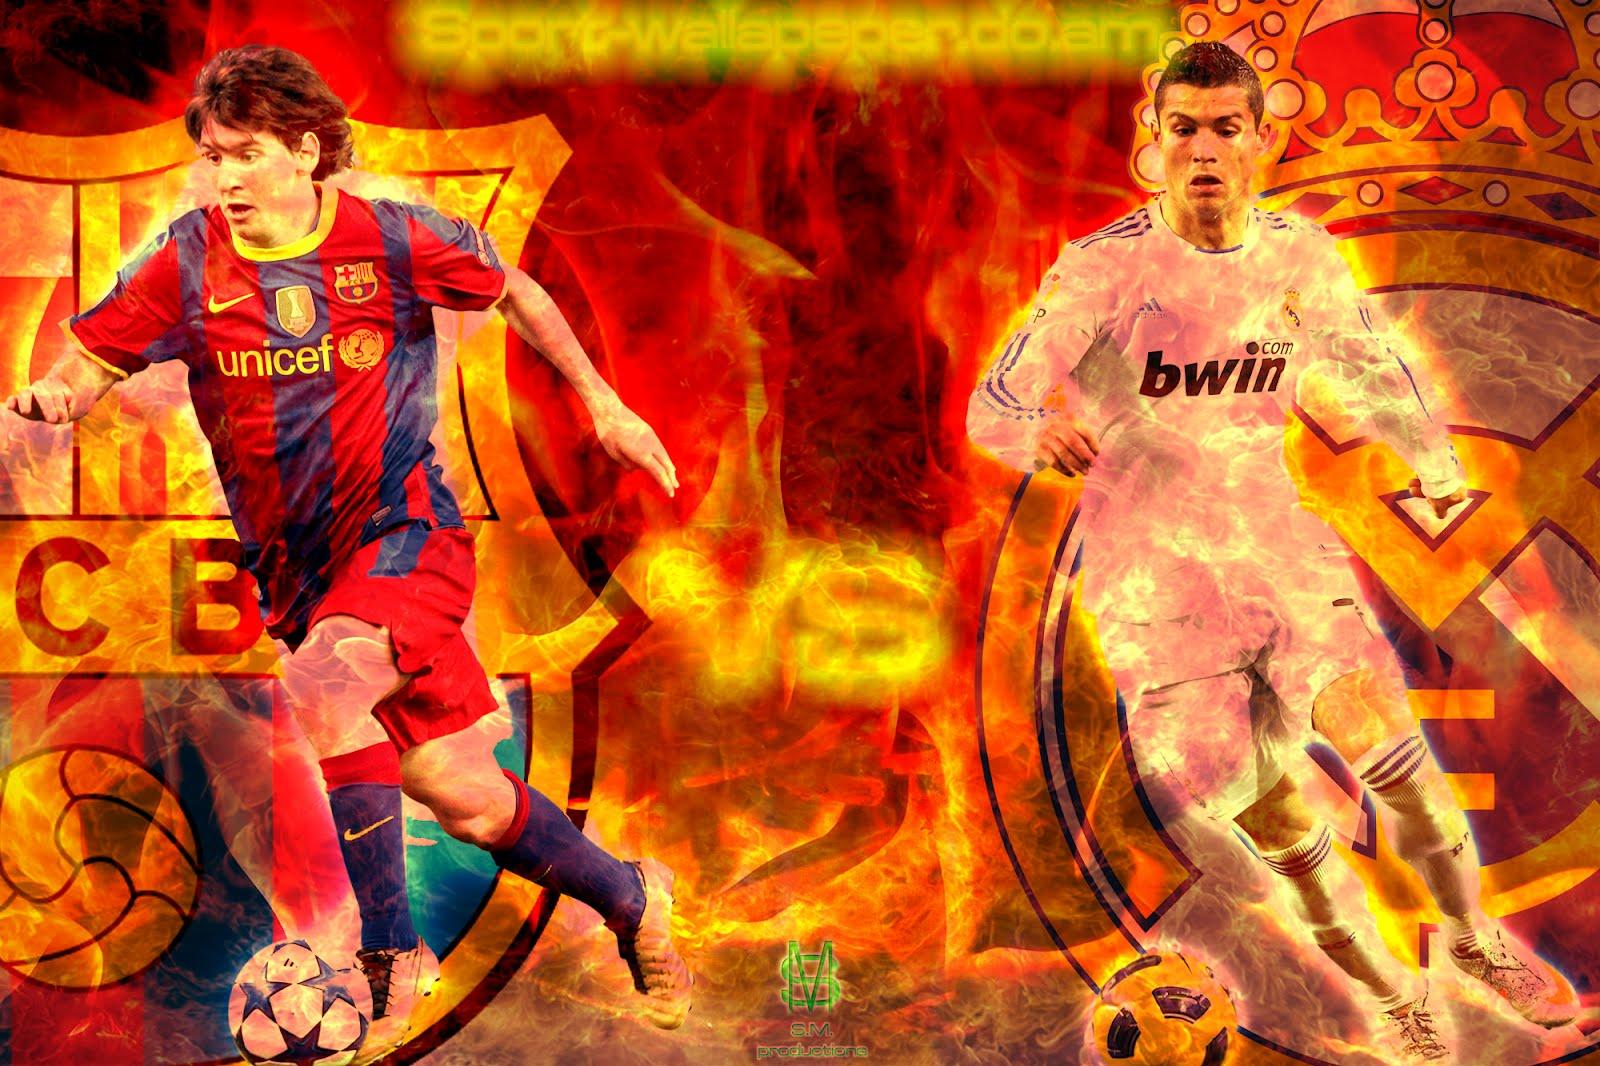 http://2.bp.blogspot.com/-dKvXNmv0oBU/UB6A7kCv-1I/AAAAAAAAAKM/ZLW09JgyLPc/s1600/Lionel_Messi_Vs_Cristiano_Ronaldo_59757.jpg